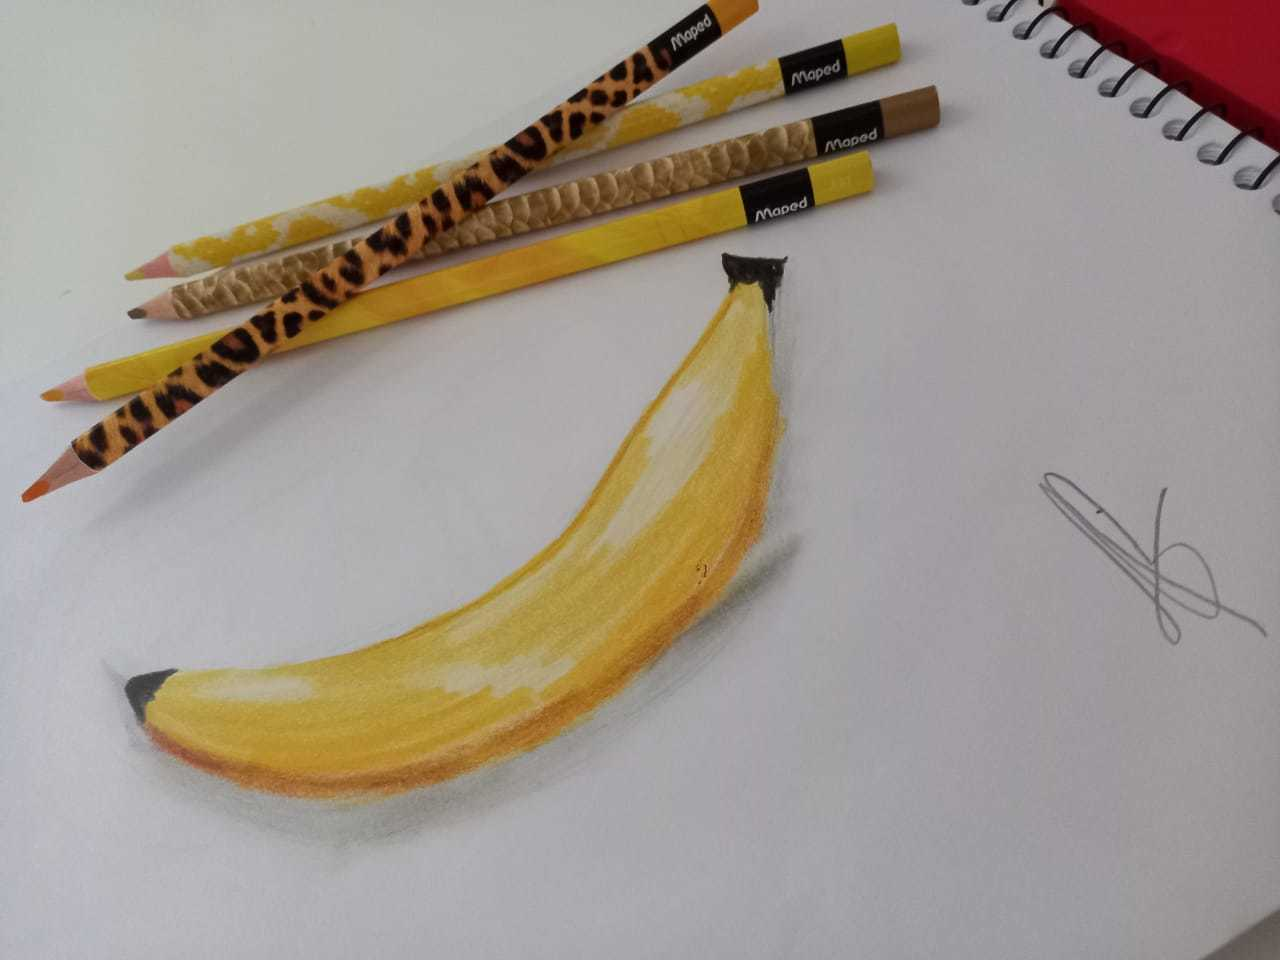 313 Bianca 10 Teresina PI Maped Color Peps Animals Banana